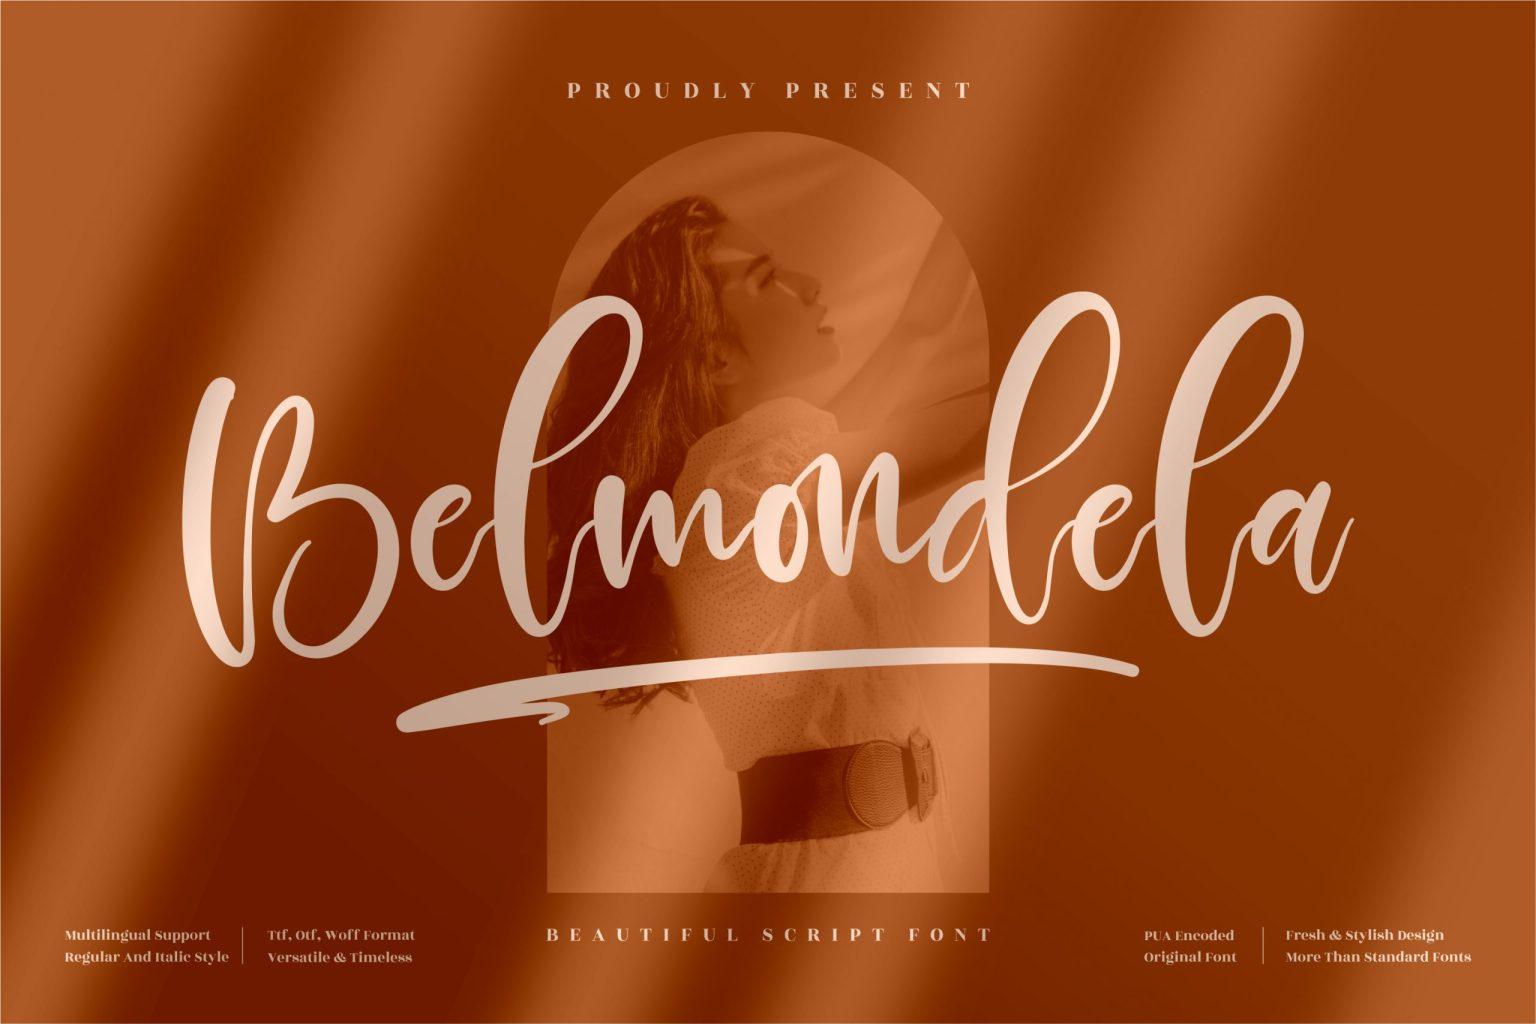 Belmondela Script Font